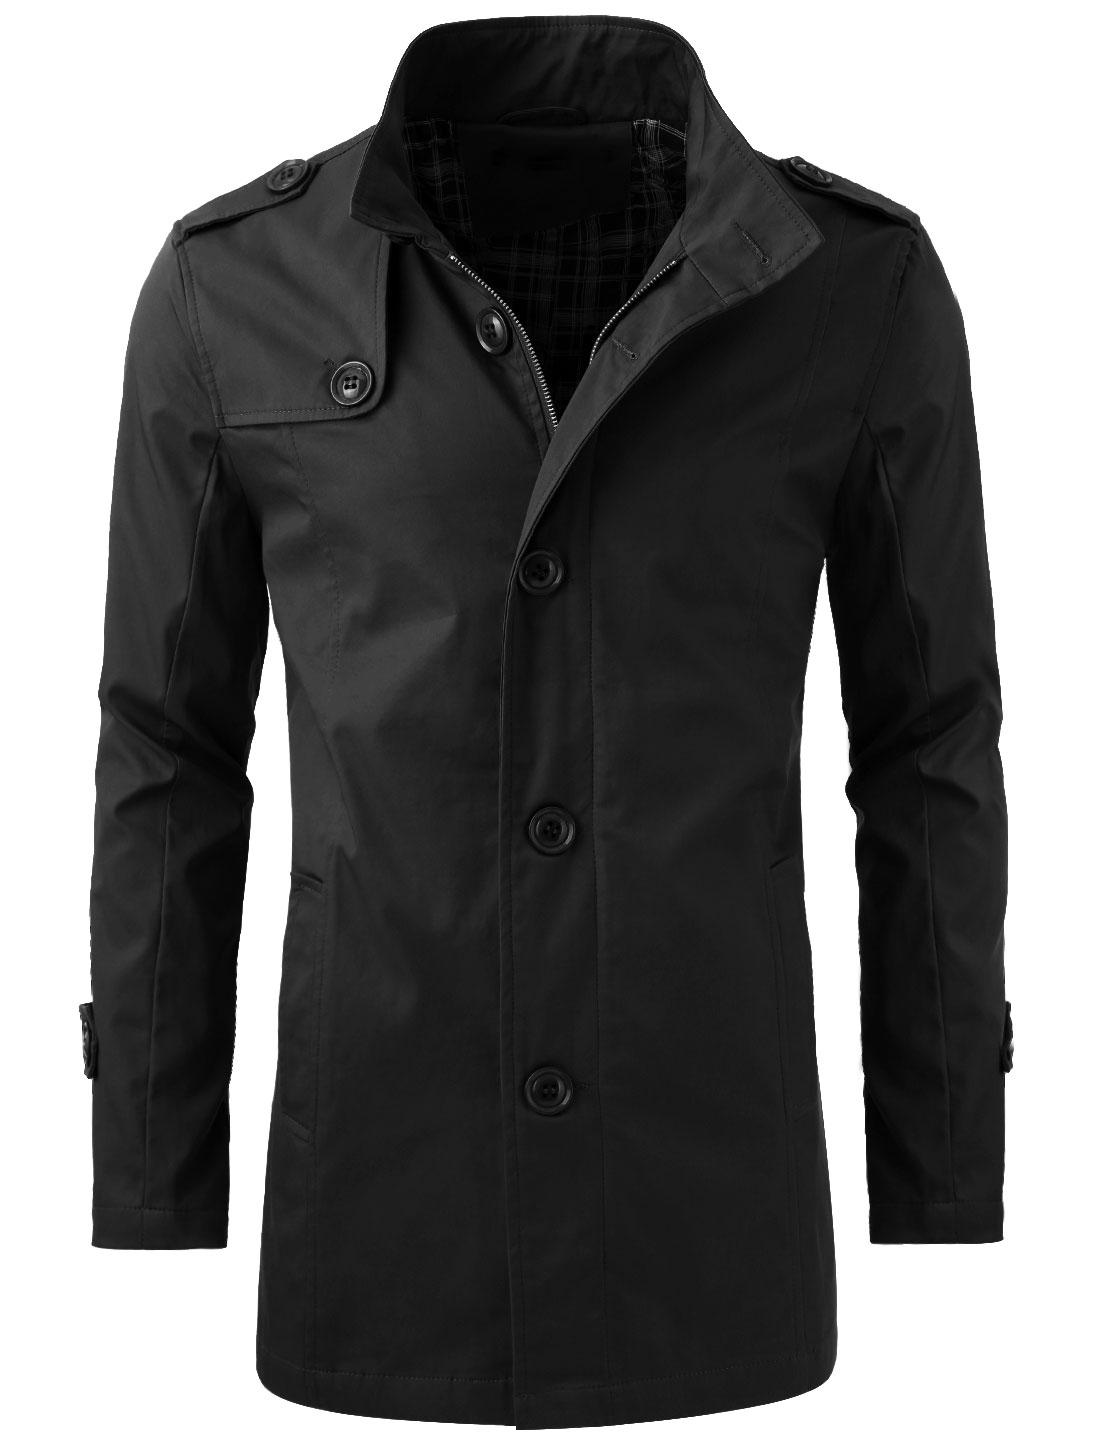 Mens Mock Neck Long Sleeve Autumn New Fashion Thin Black Trench Coat M